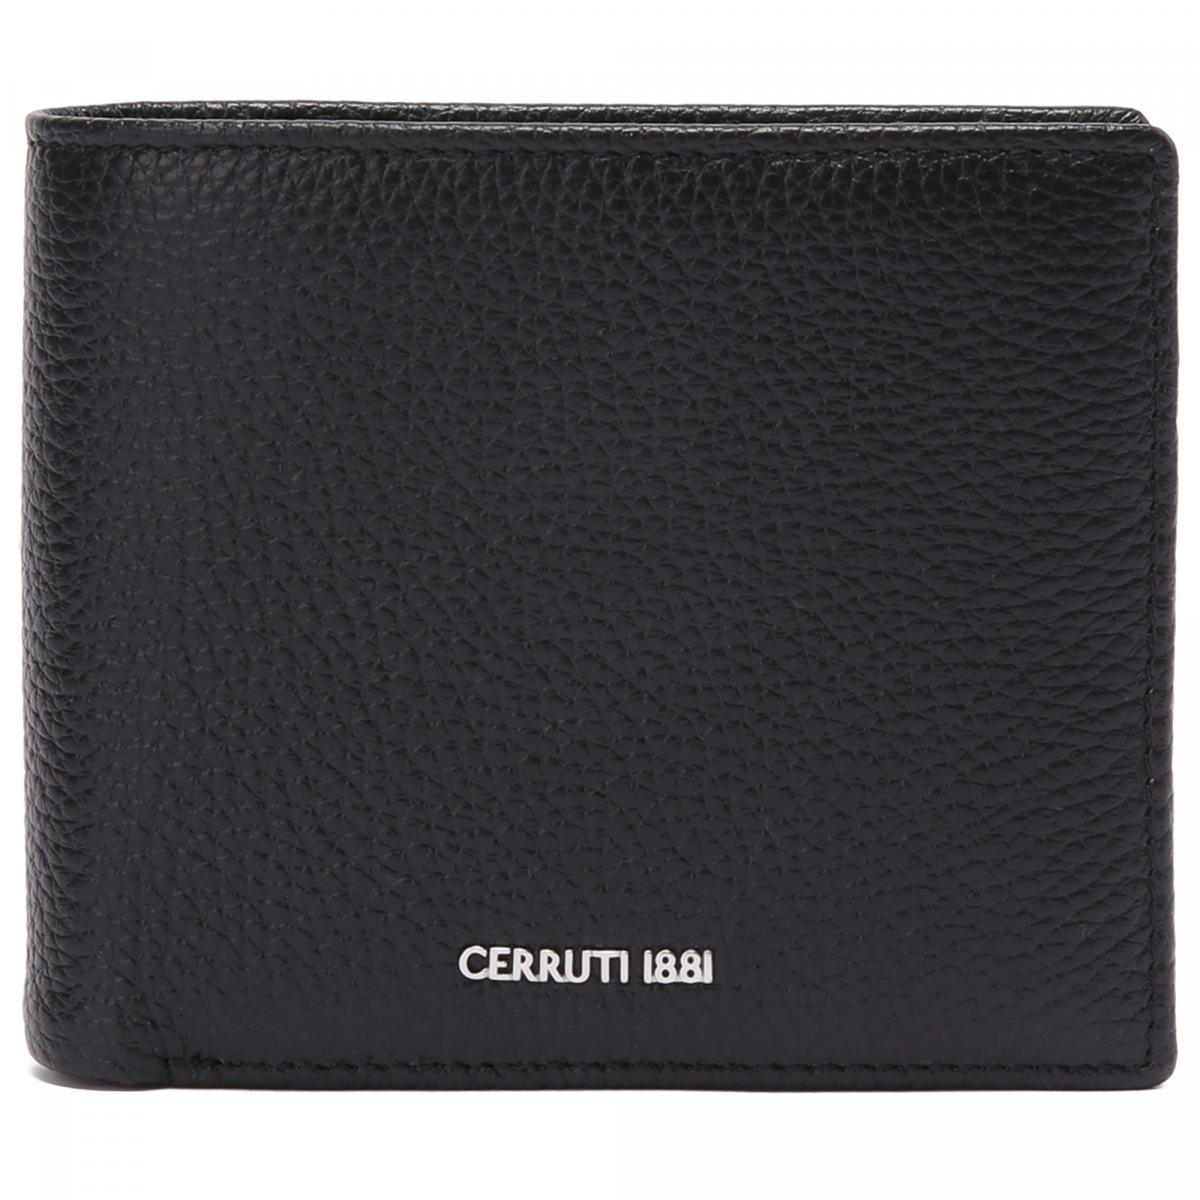 Бумажник Cerruti 1881